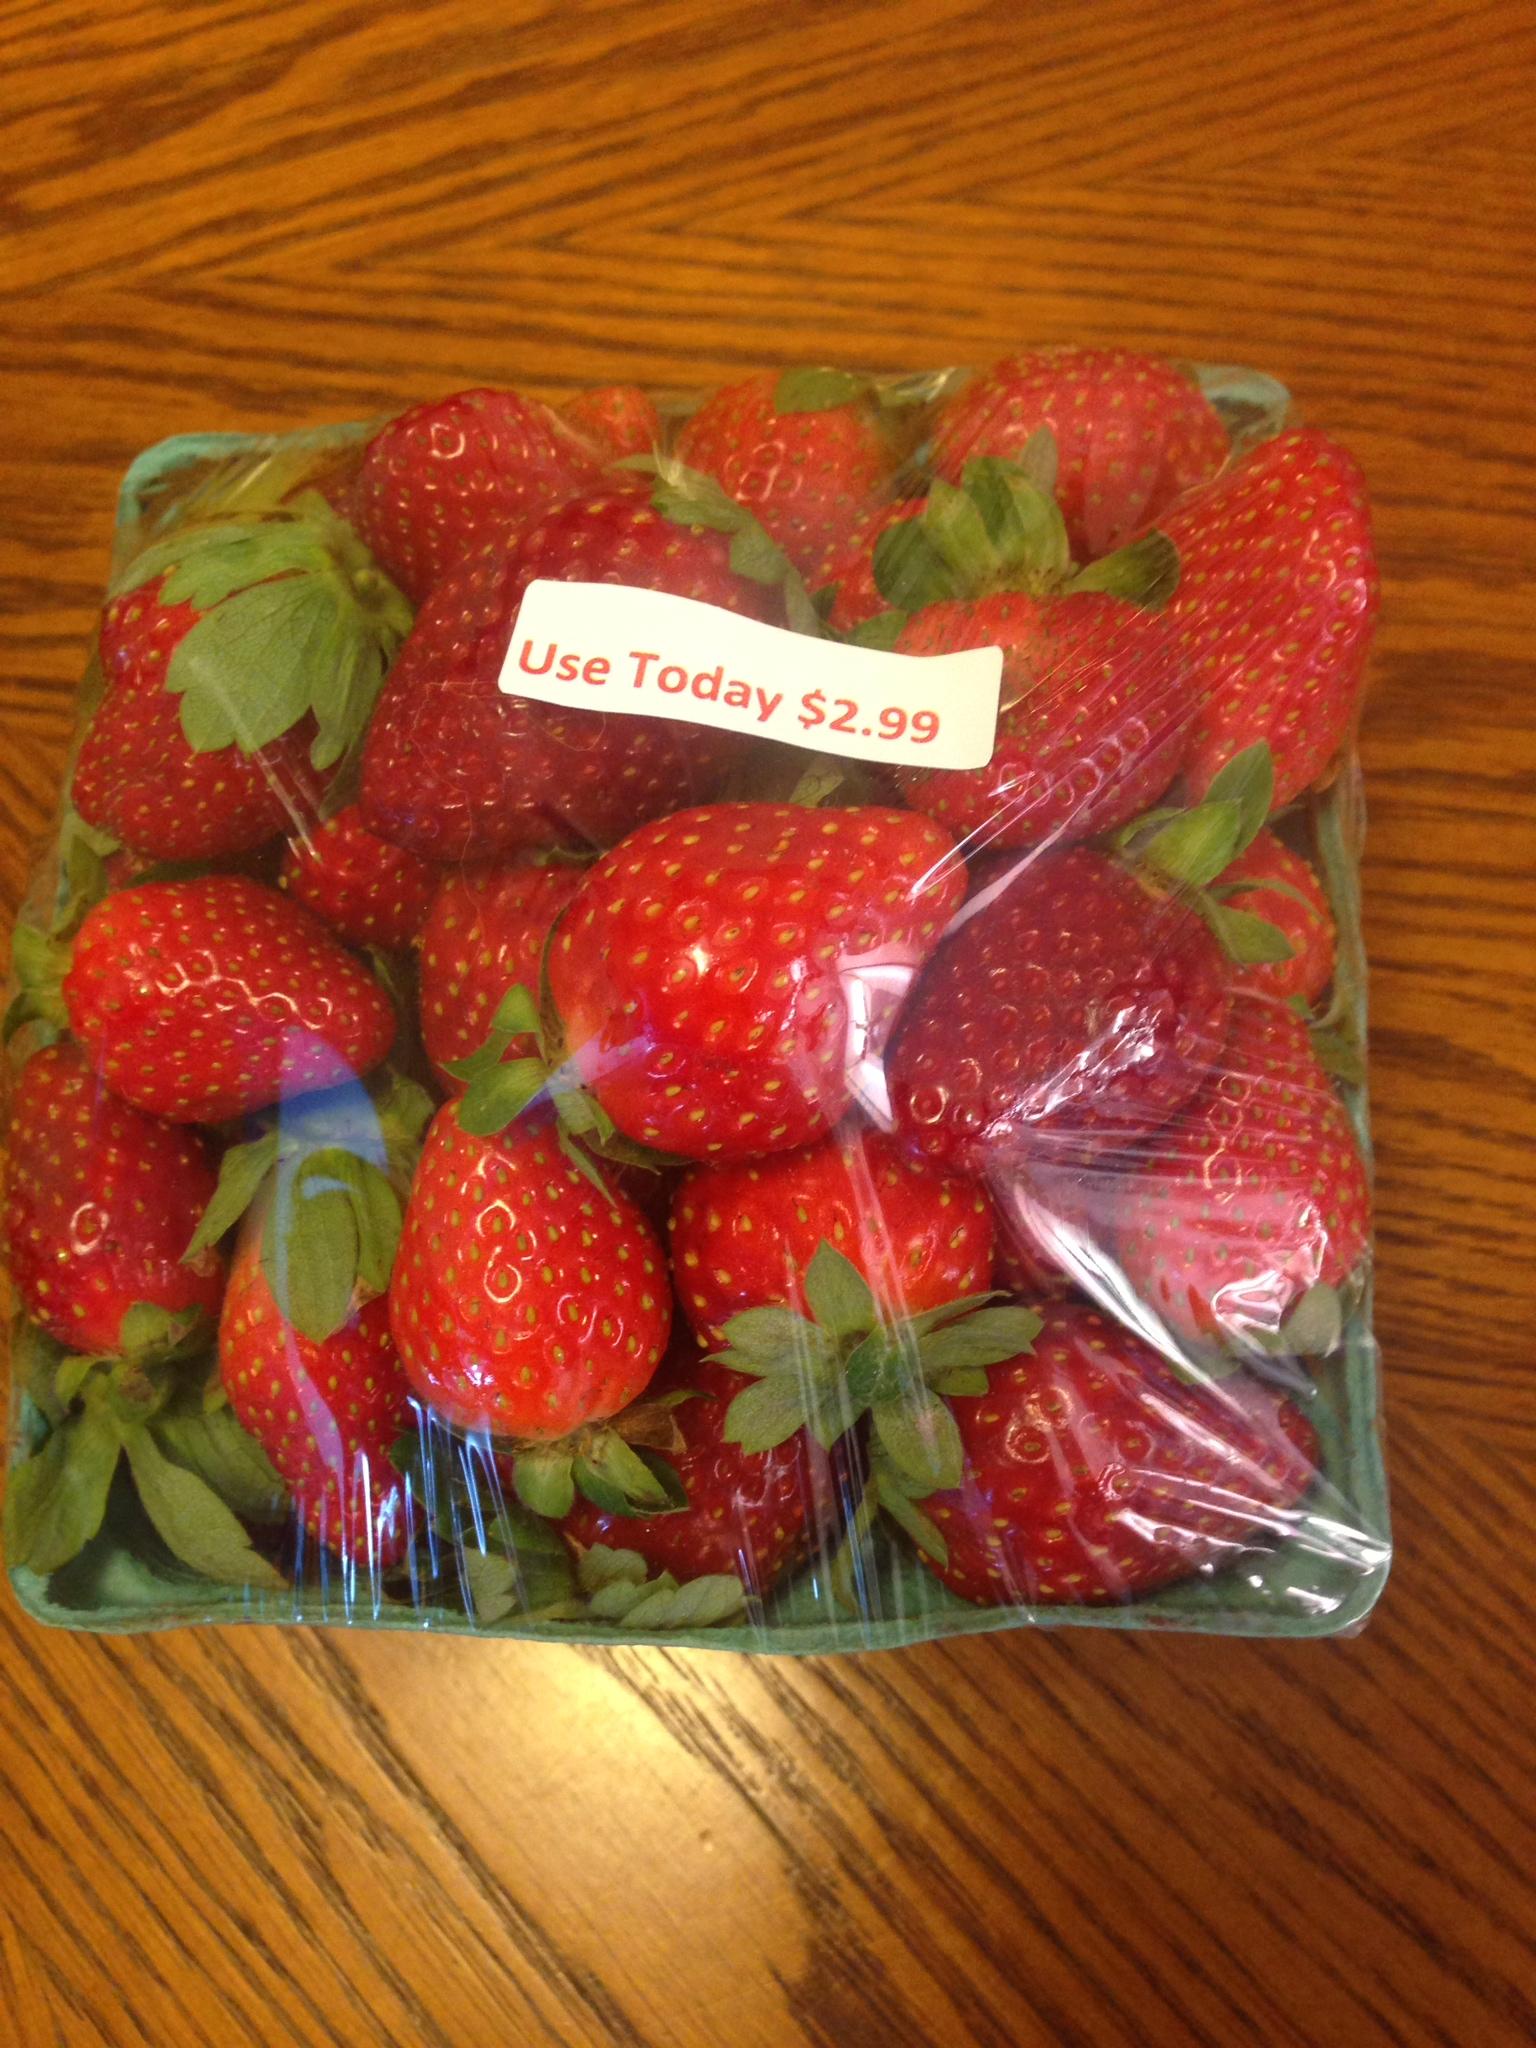 cheap strawberries